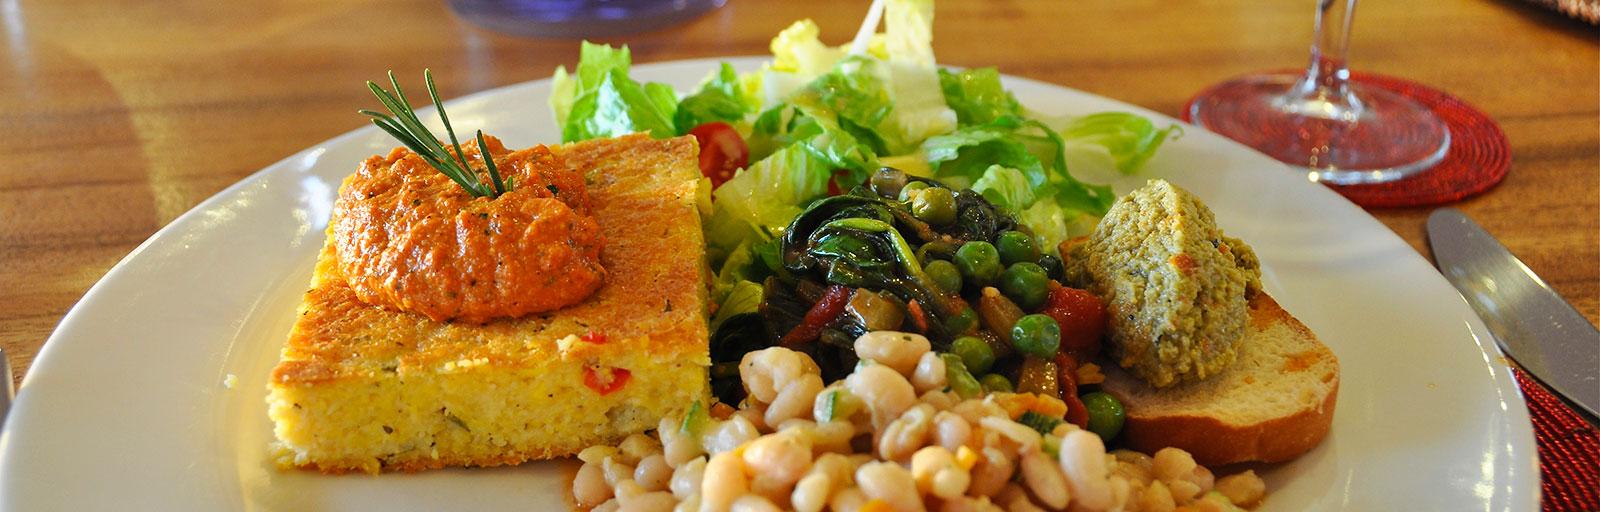 Yoga Retreat Cuisine: Gourmet Dining